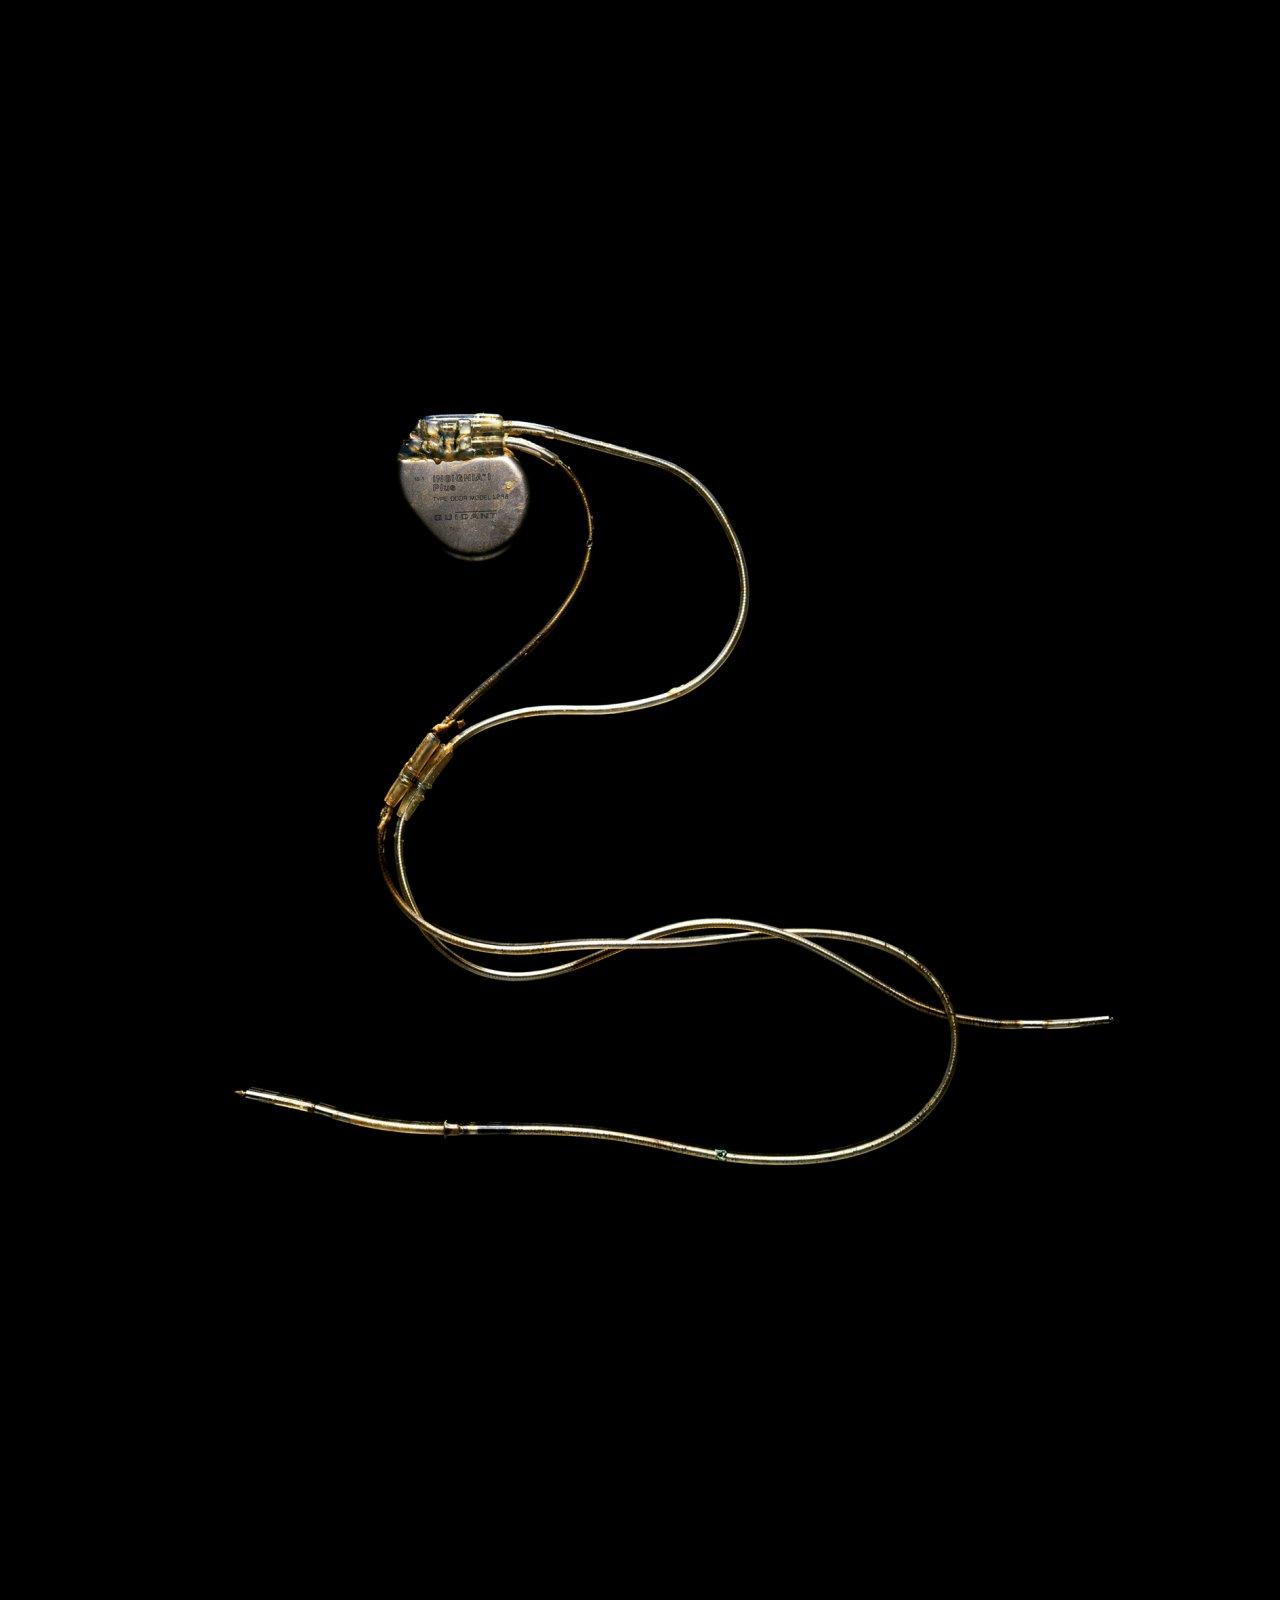 Fragile, Pacemaker, 2010 © Raphaël Dallaporta